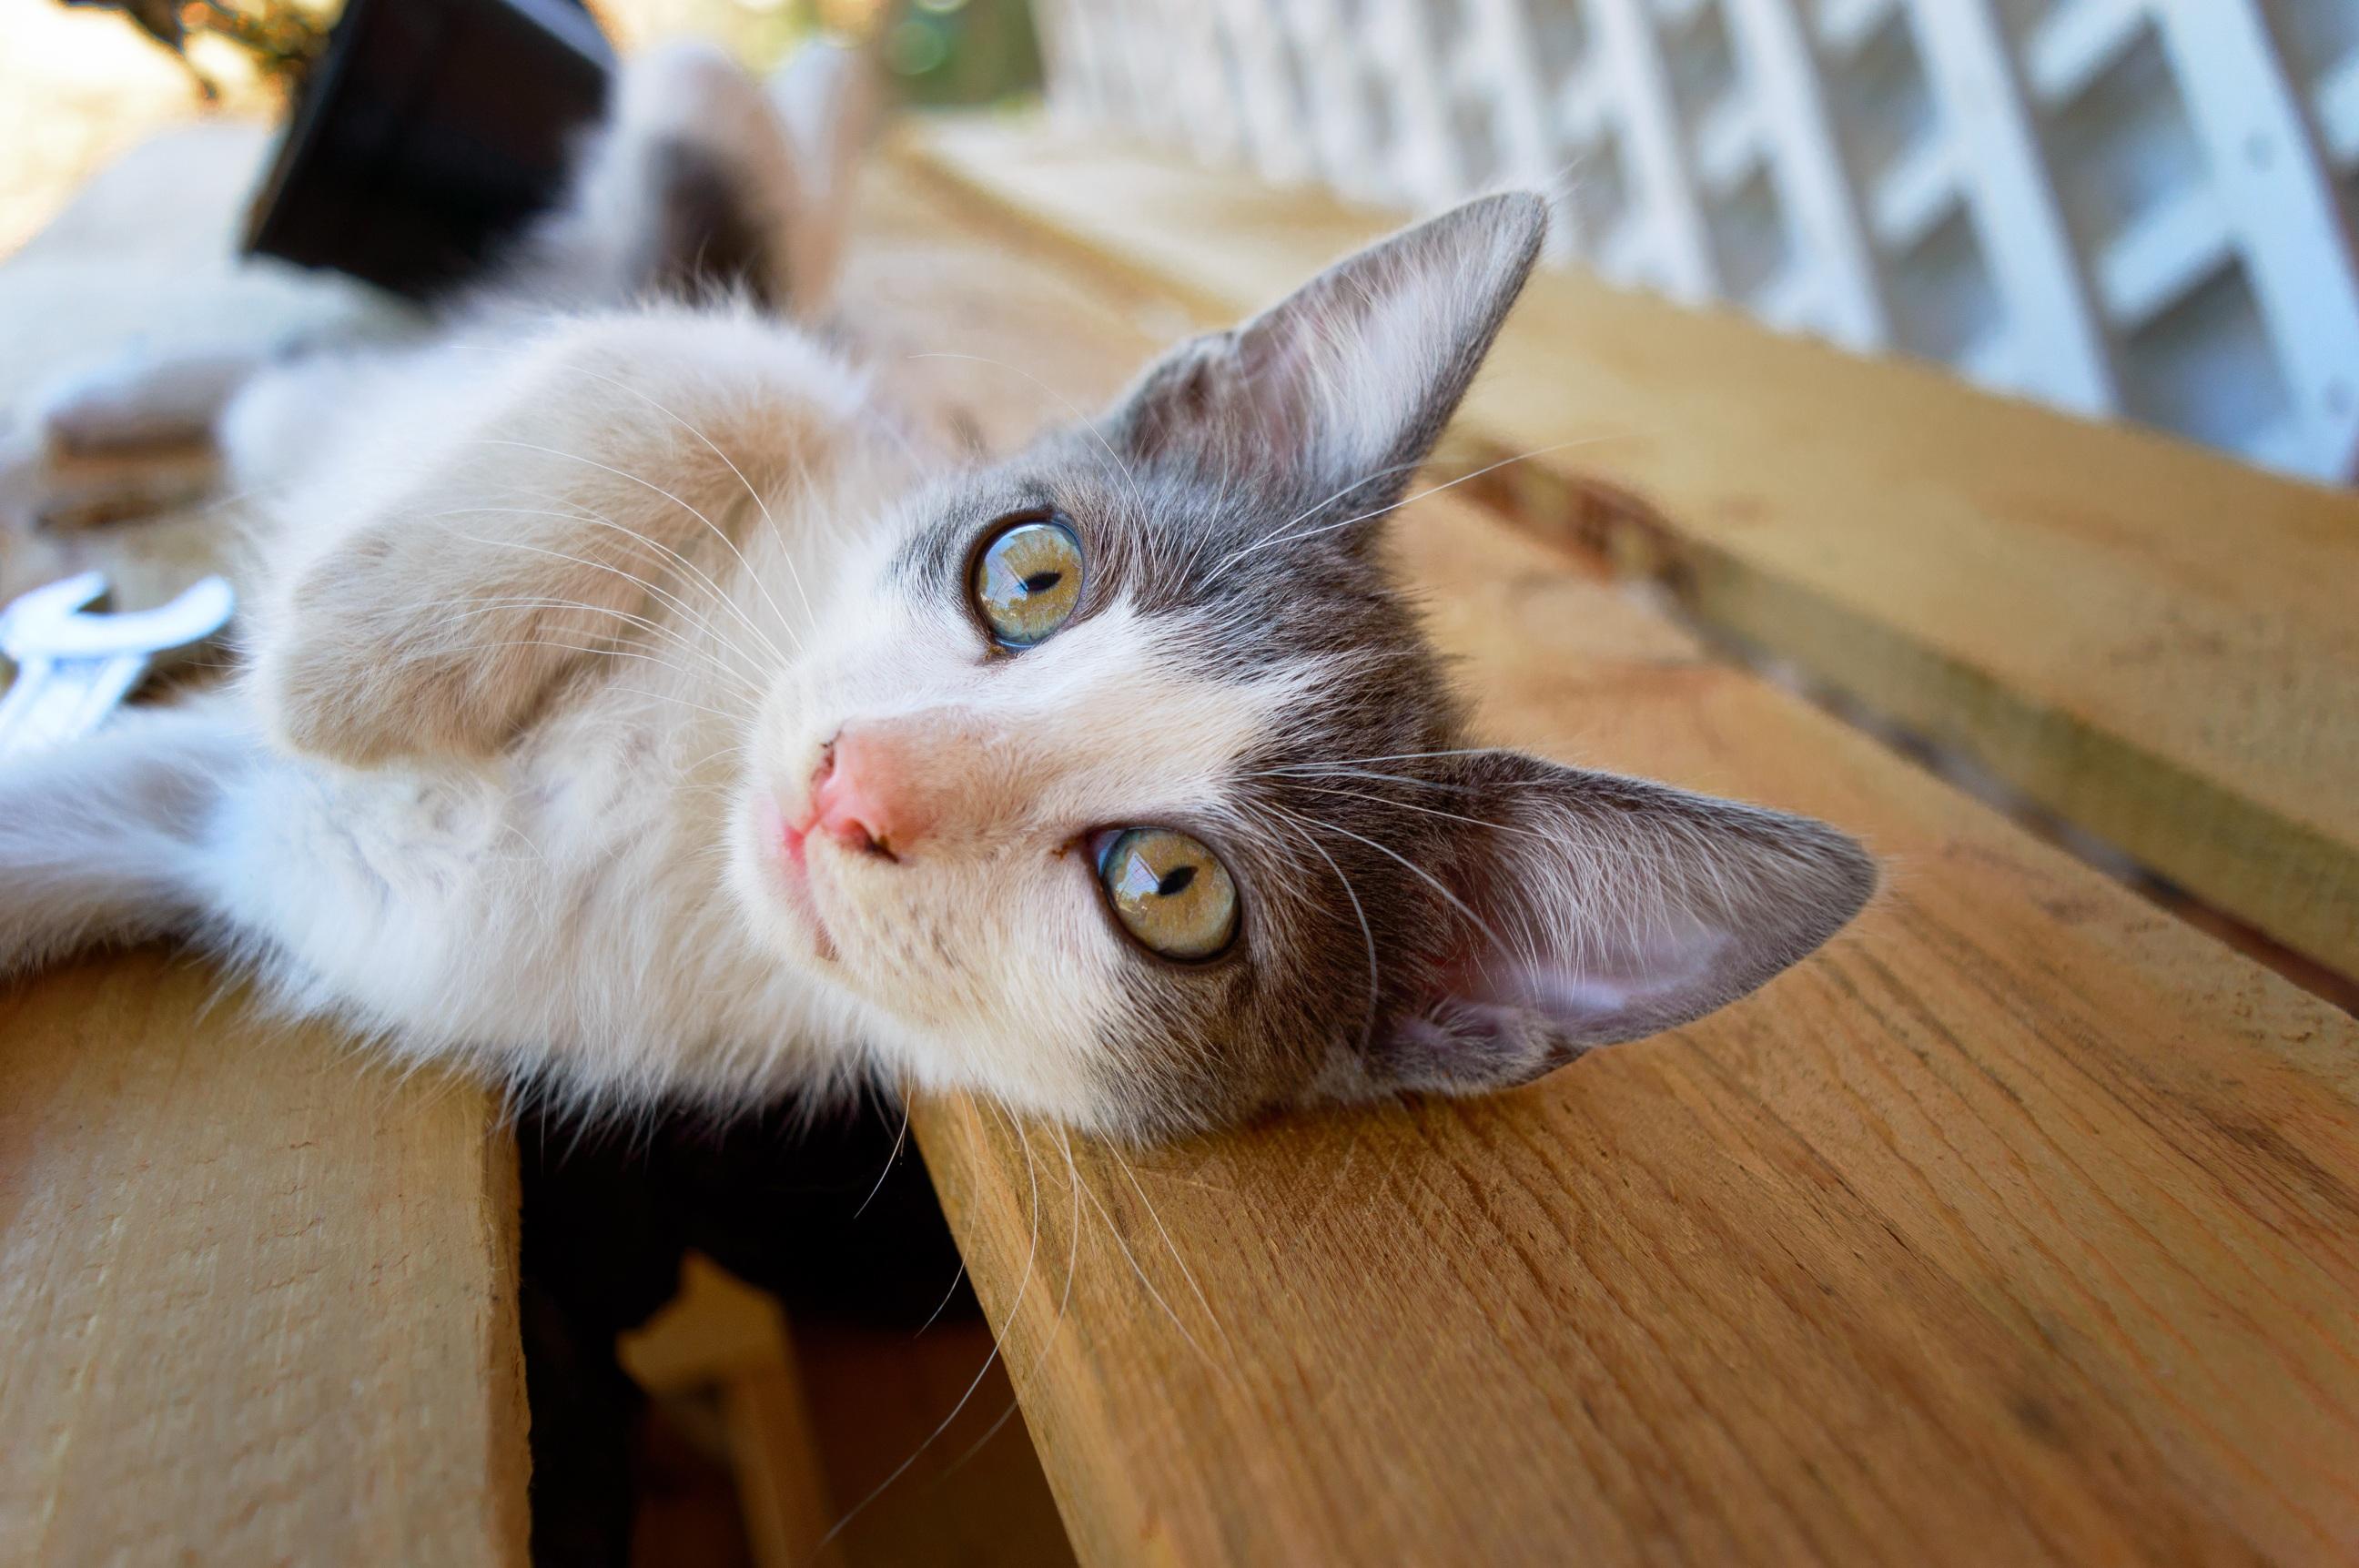 cat cats animal loving cute kitten kitty pet fur skin mammal domestic hair feline close portrait nose whiskers sized adorable